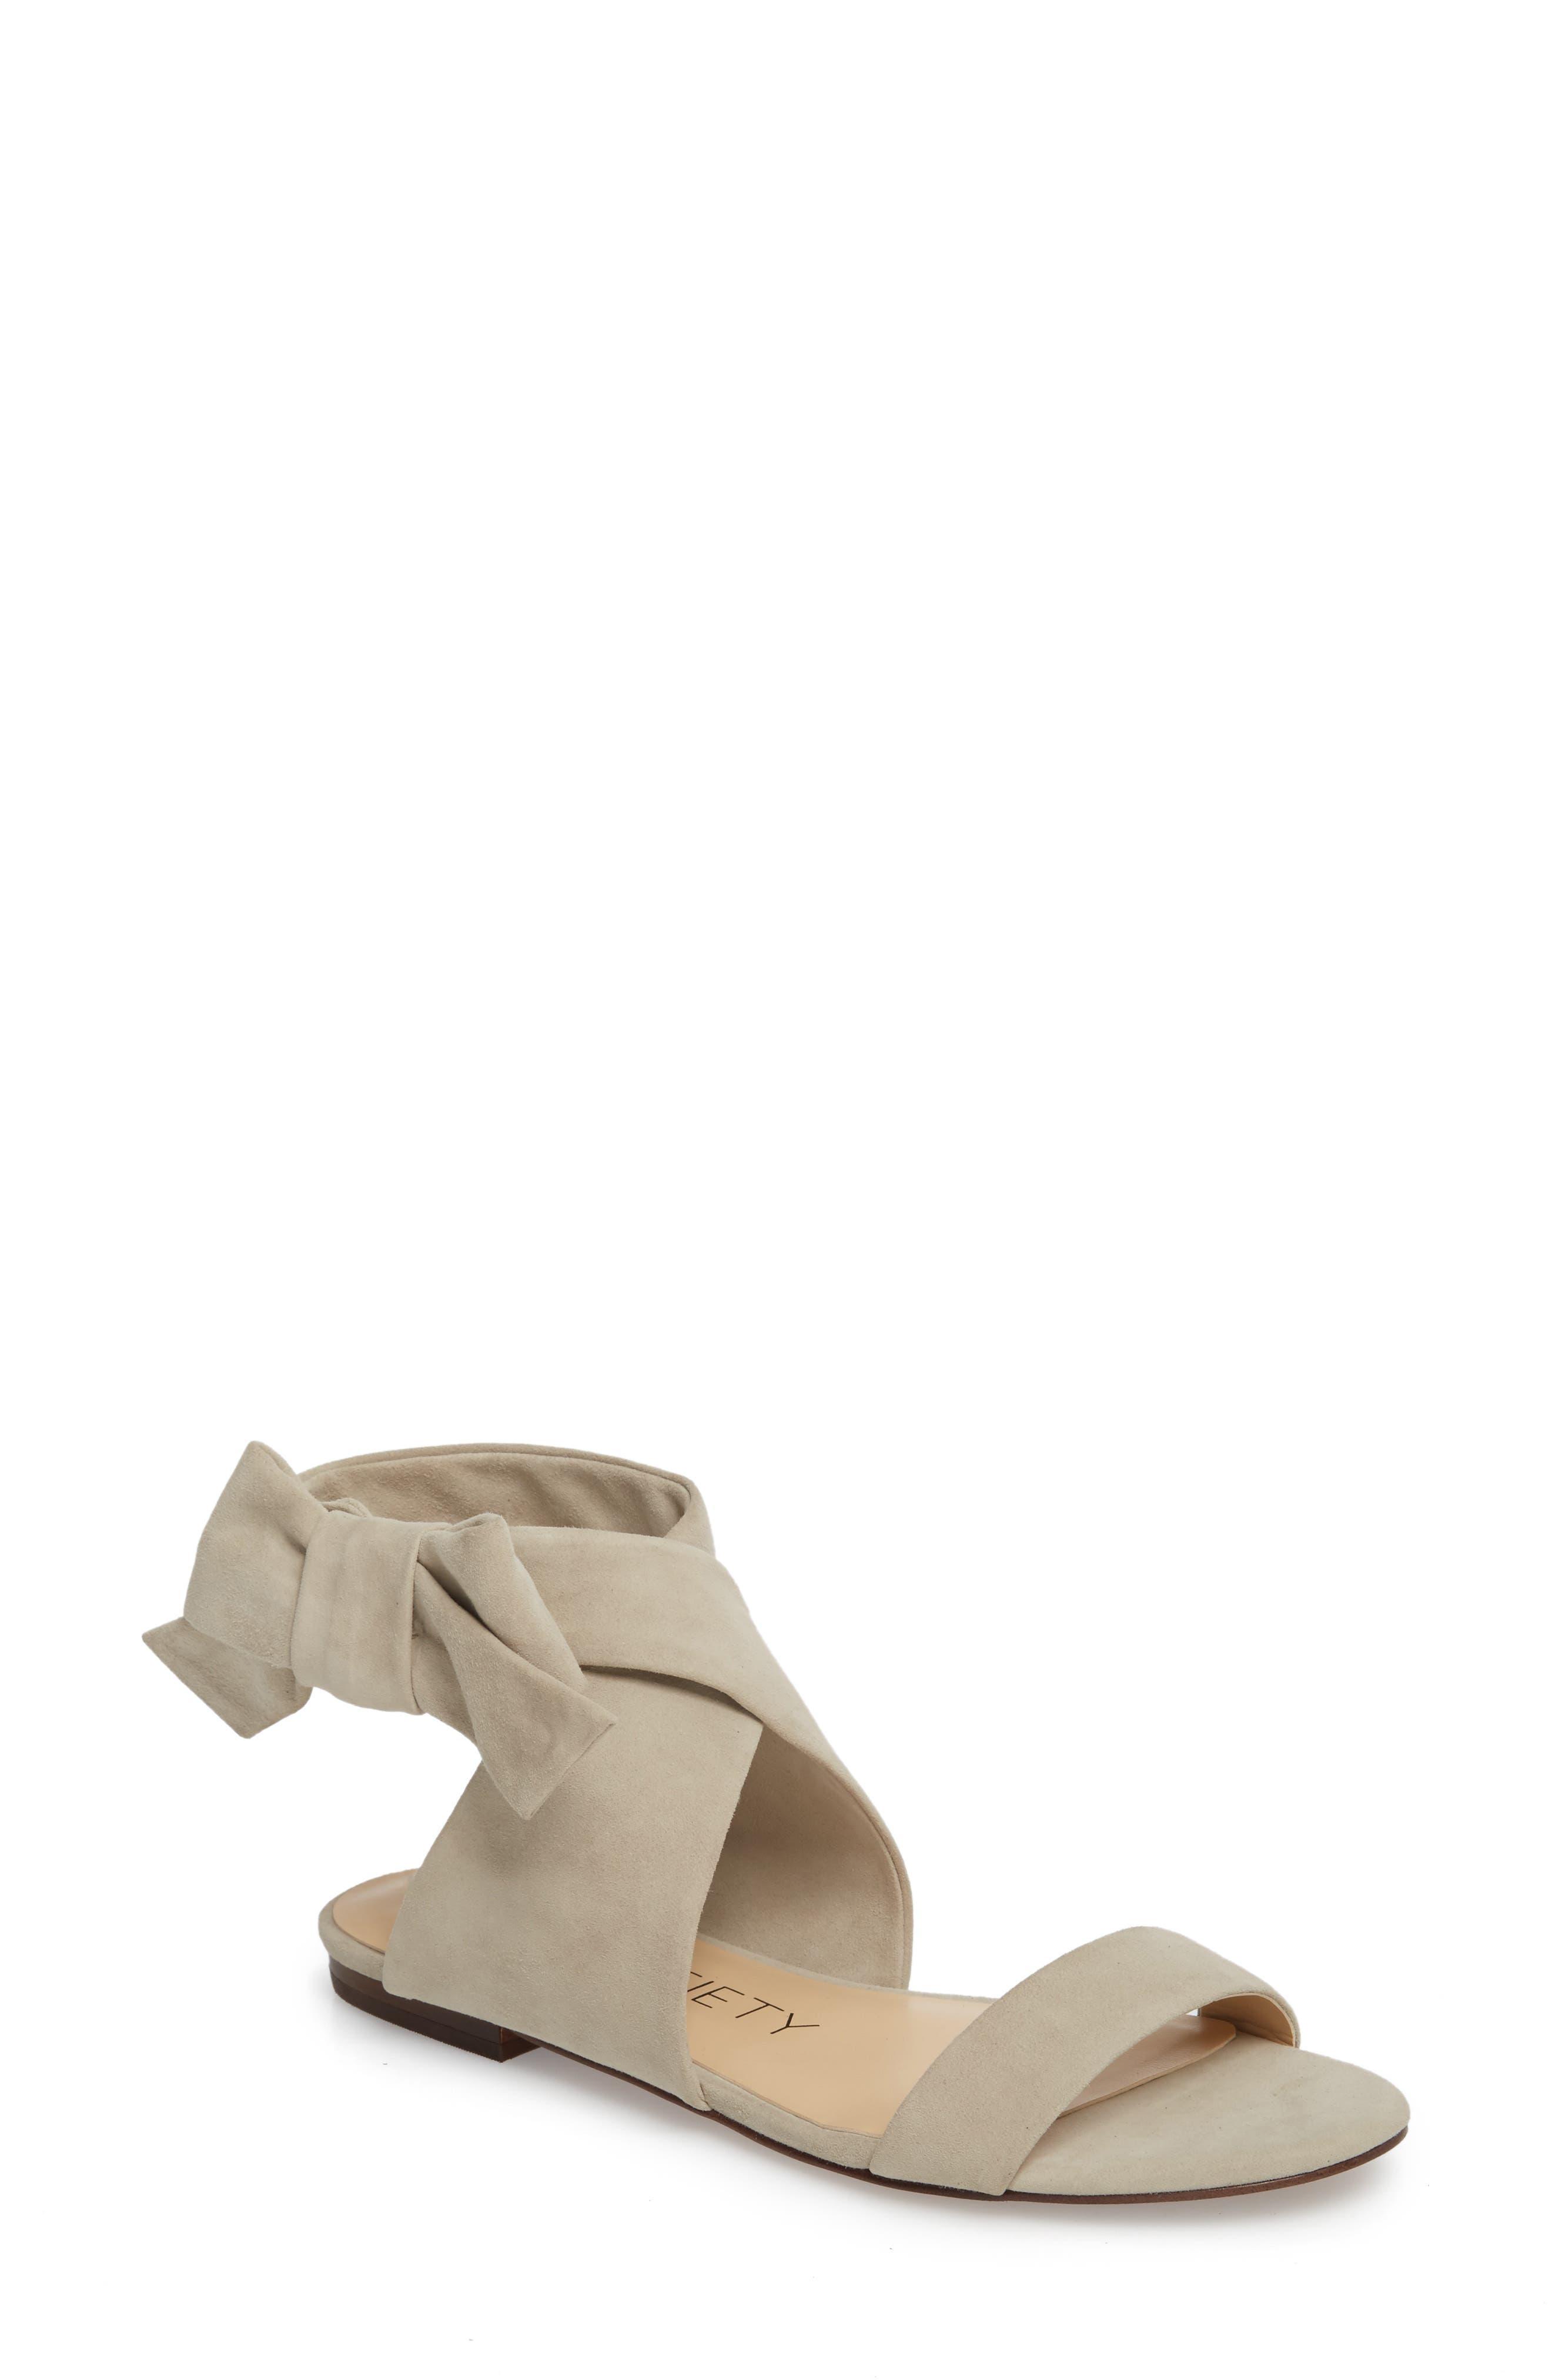 Calynda Bow Ankle Wrap Sandal,                             Main thumbnail 1, color,                             020